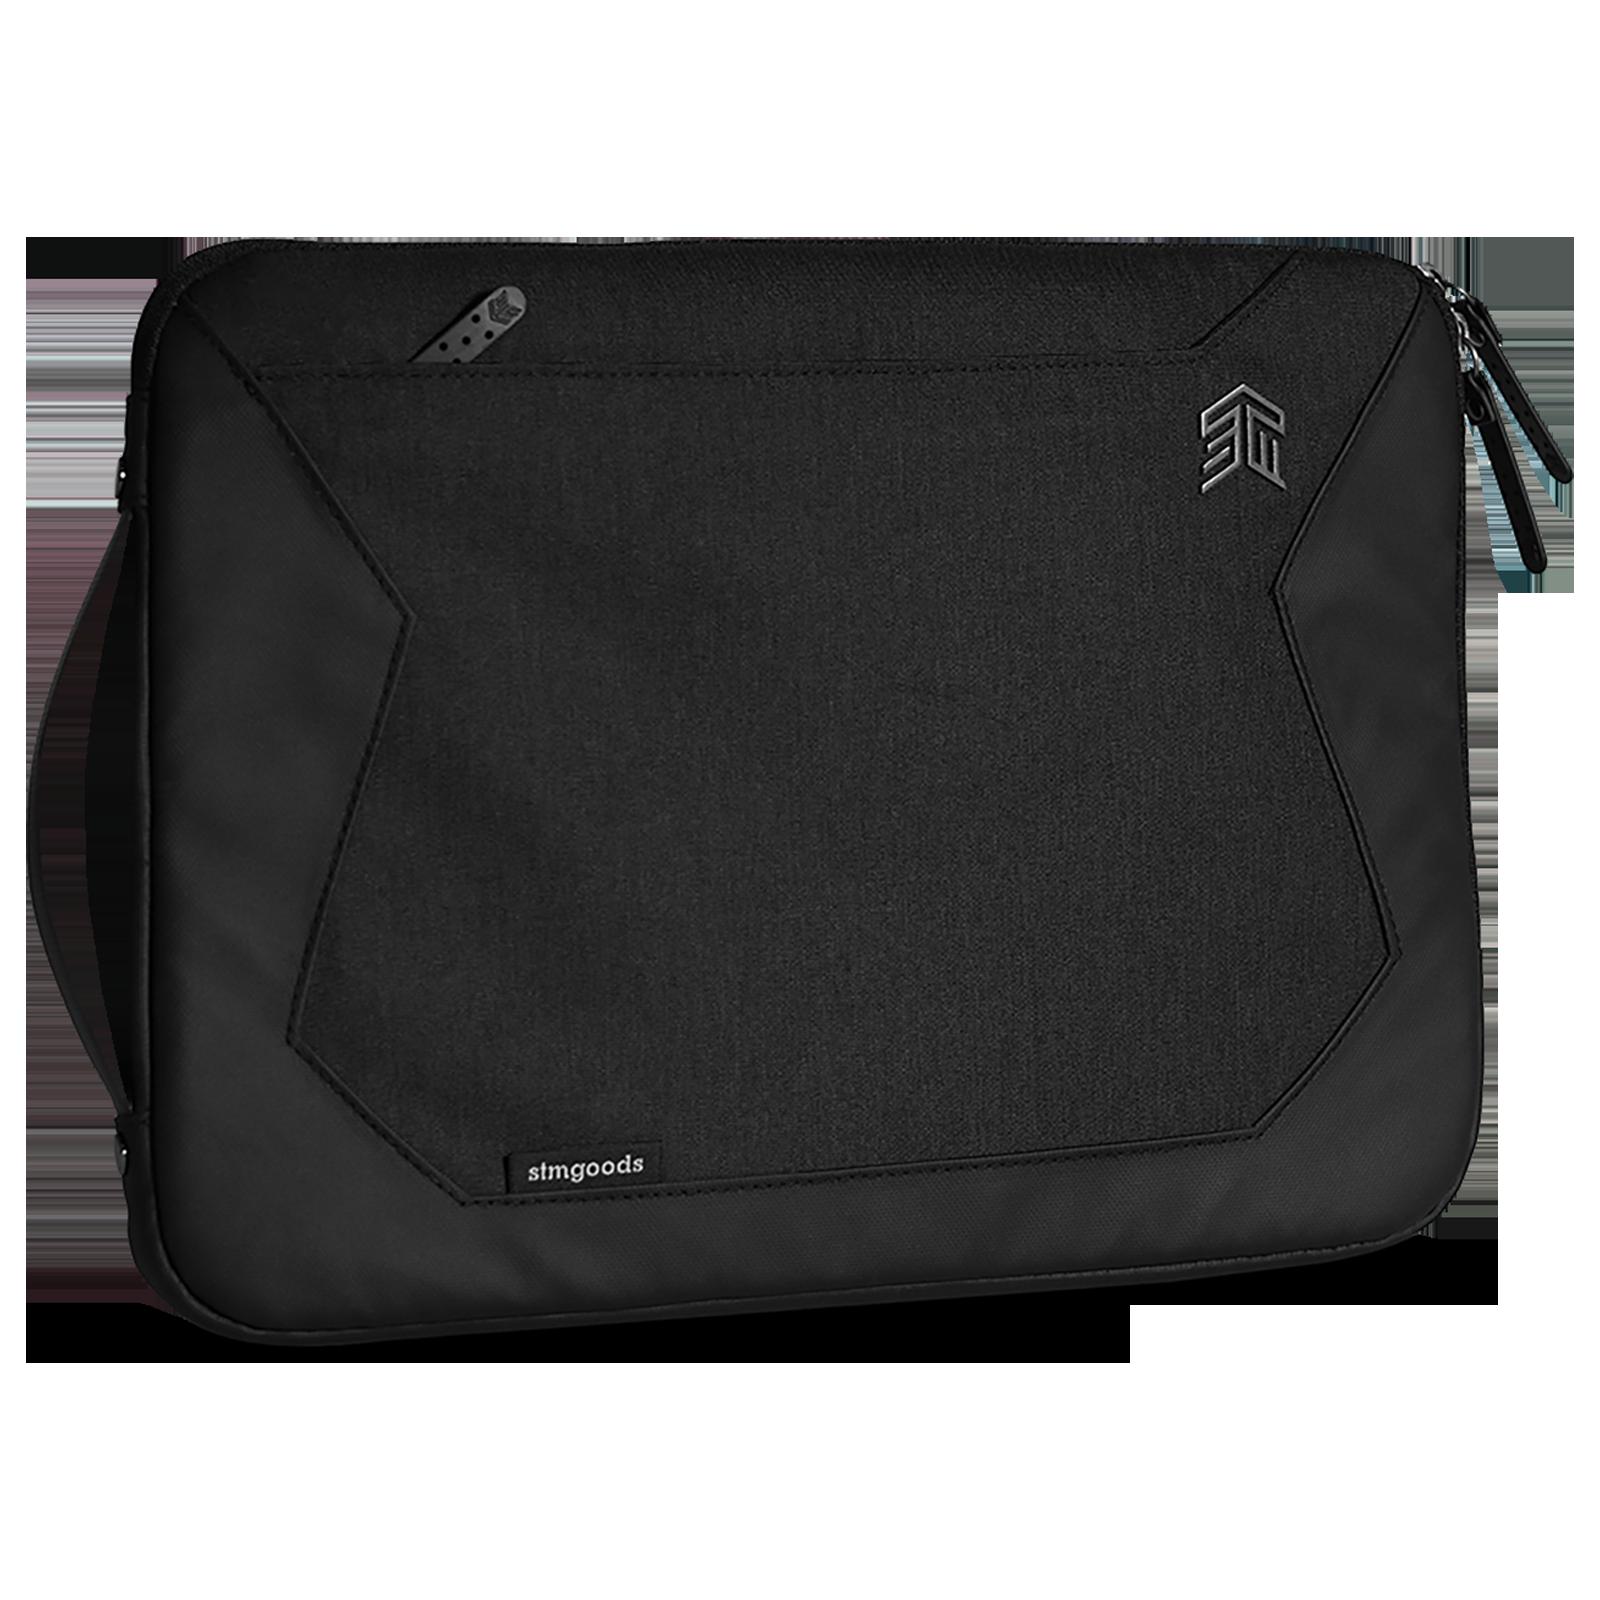 STM Myth Litres Polyester Sleeve for 13 Inch Laptop (TPU Coated Webbing Handles, STM-114-184M-05, Black)_1